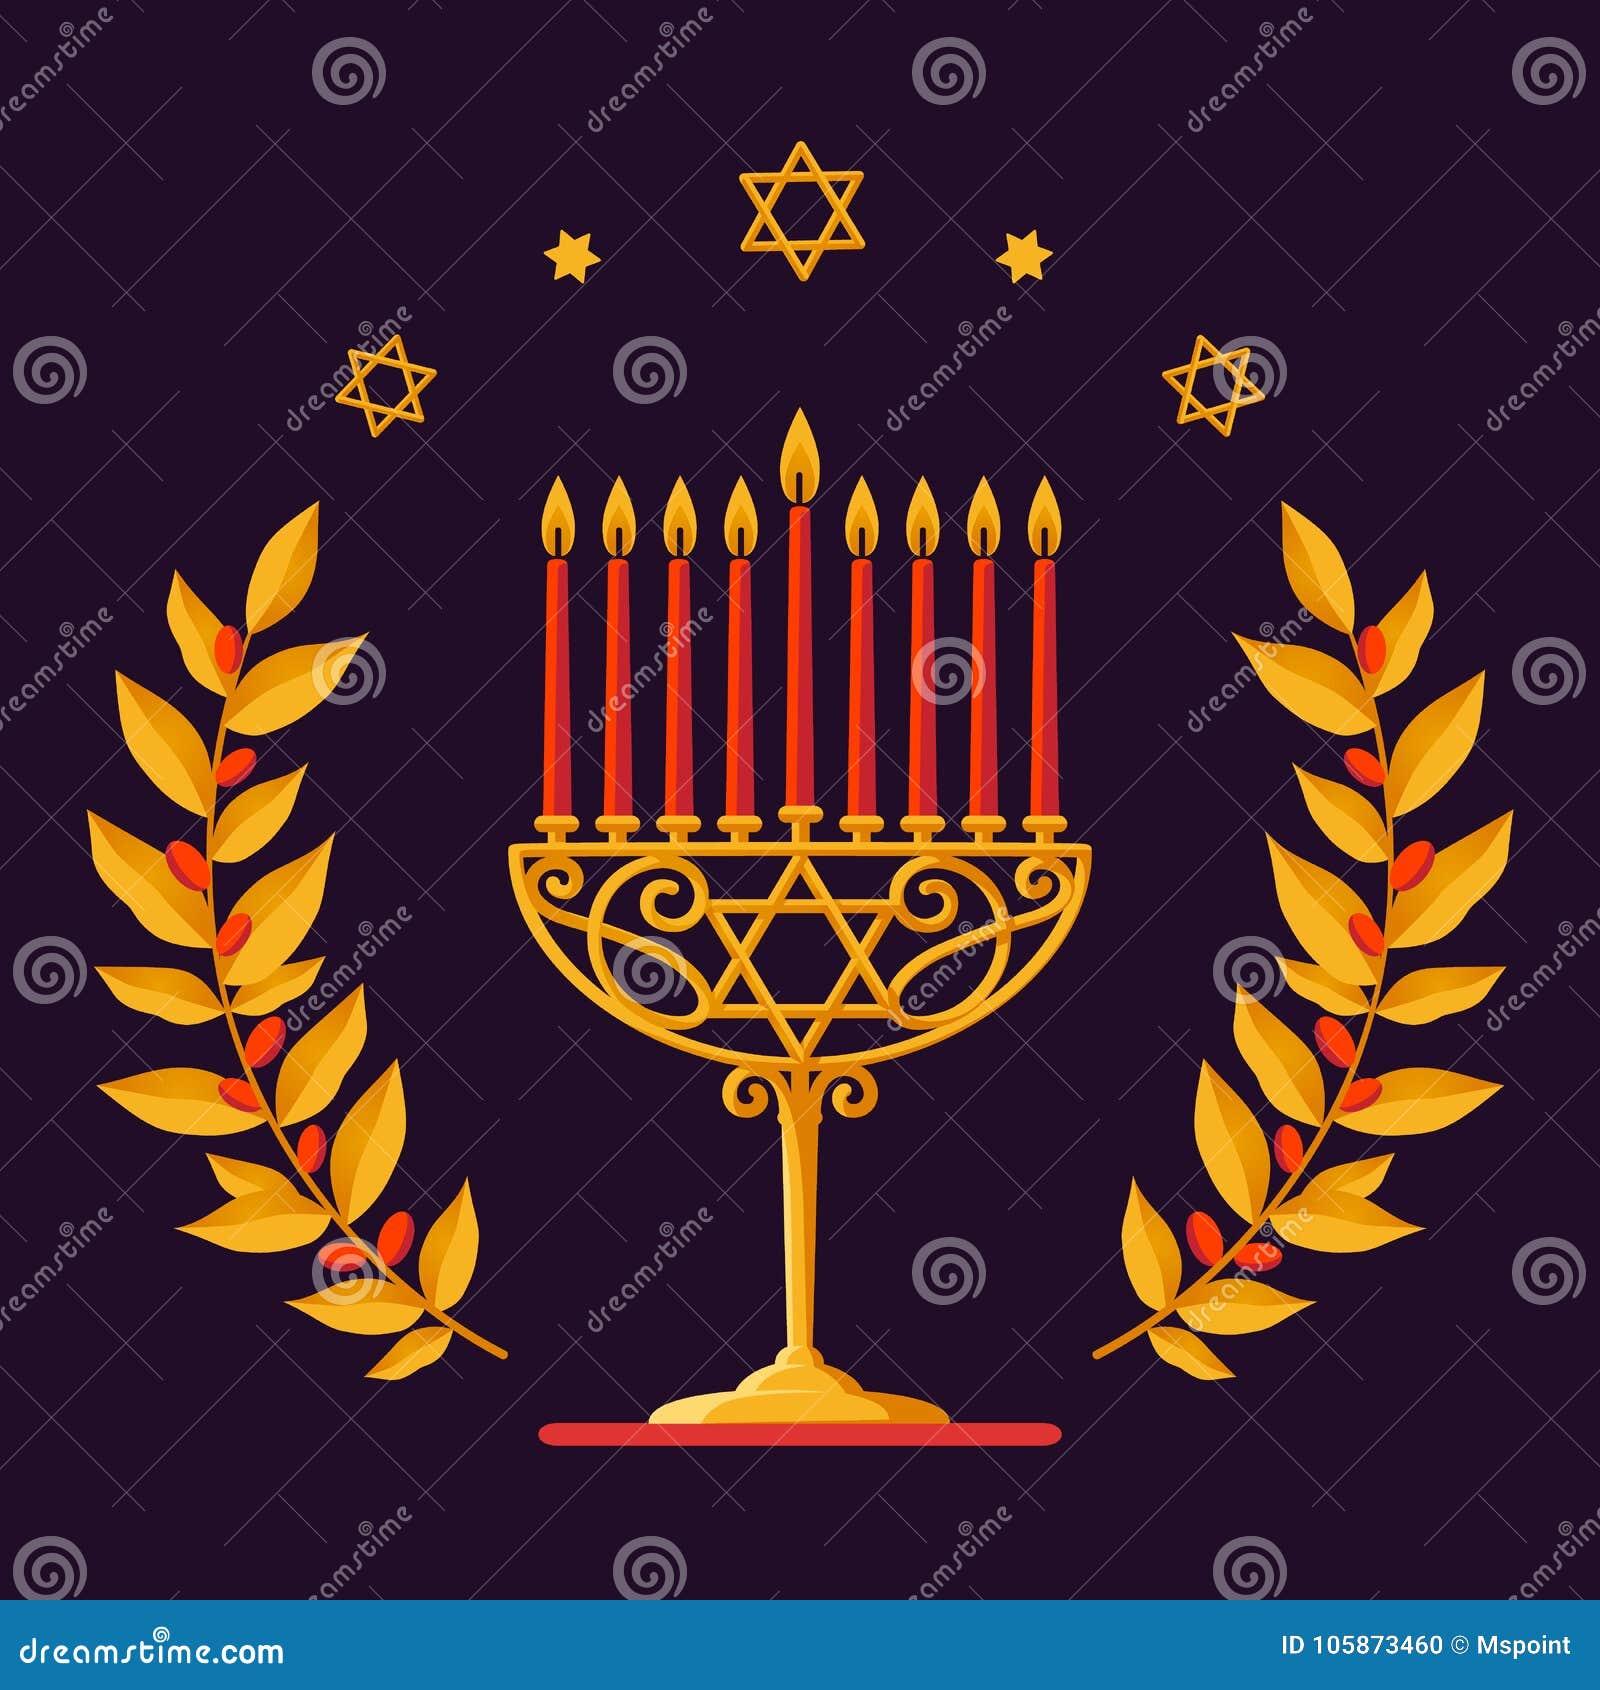 Hanukkah vector card happy hanukkah greeting inscription jewish download hanukkah vector card happy hanukkah greeting inscription jewish holiday hanukkah gold menorah m4hsunfo